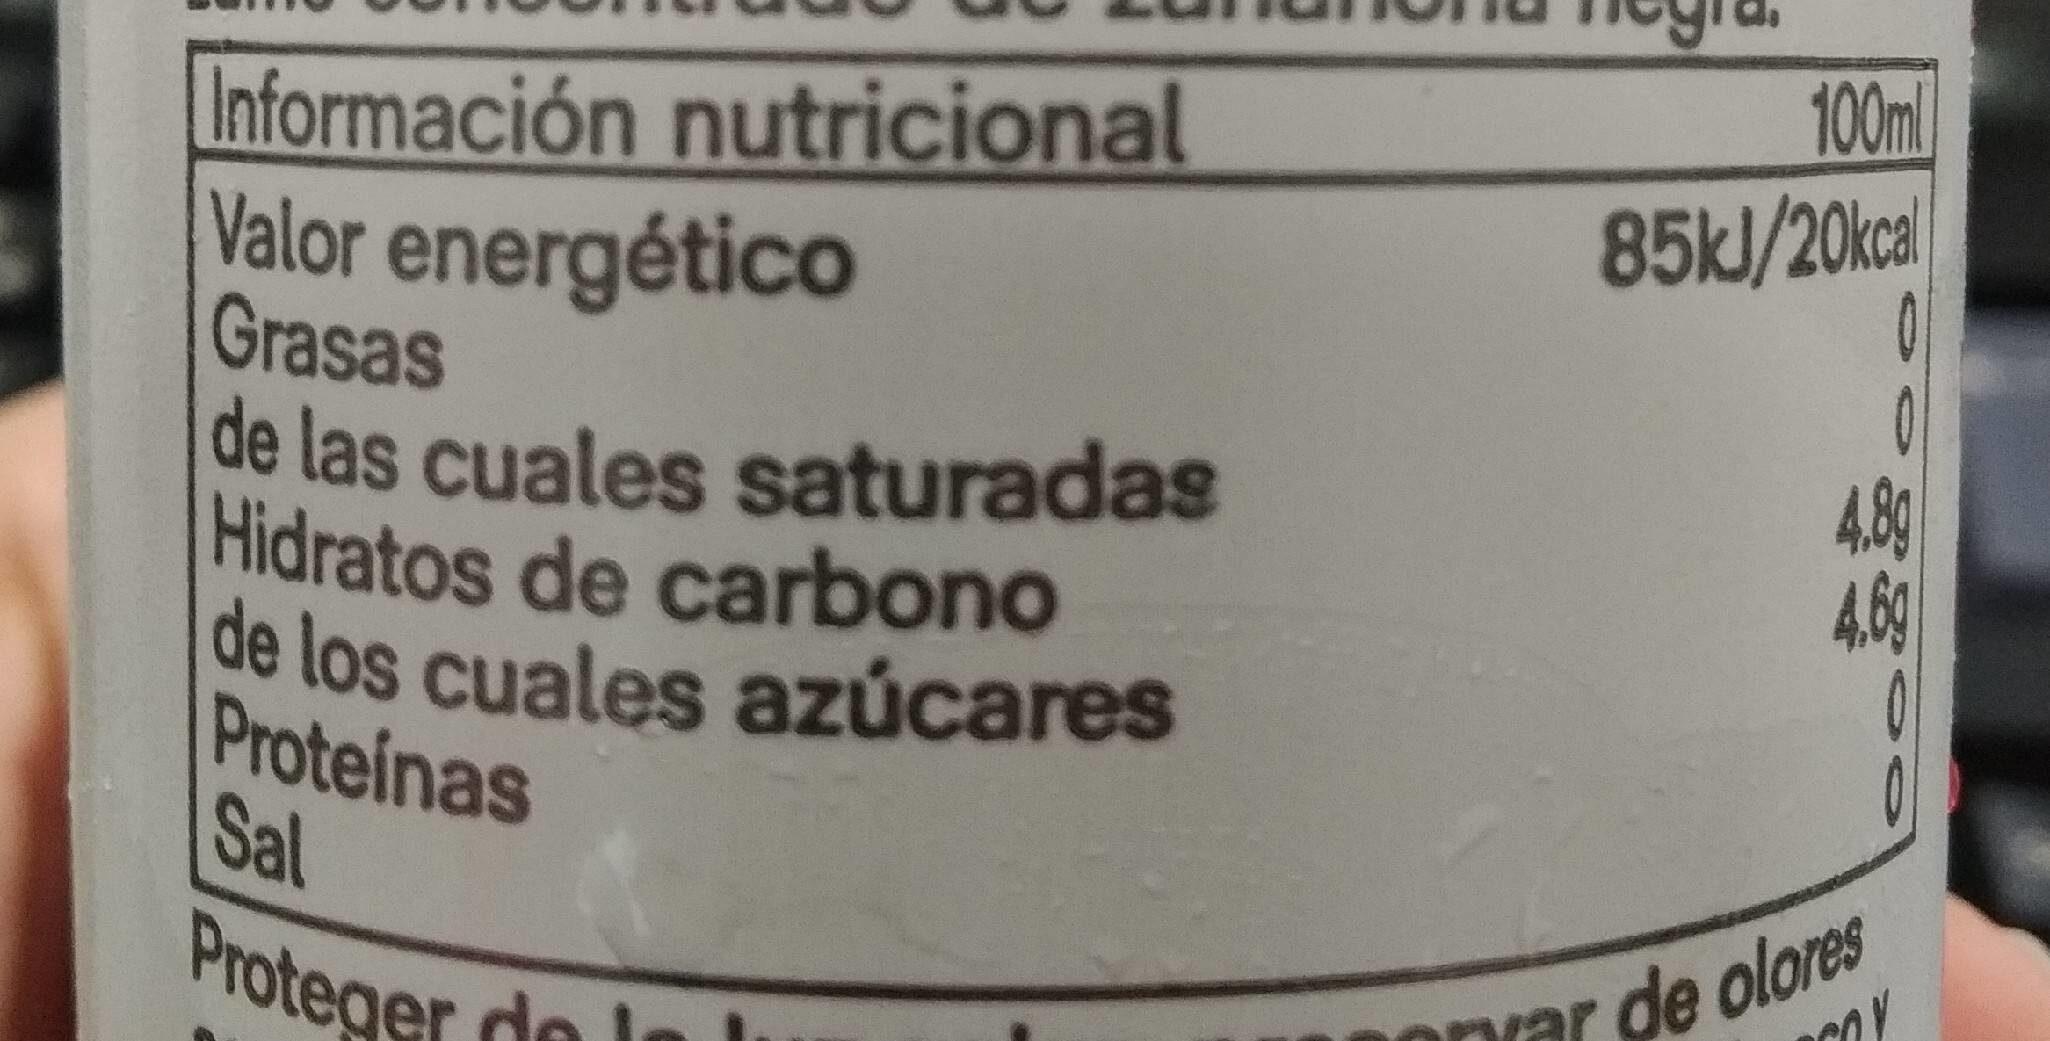 Blood Orange - Informació nutricional